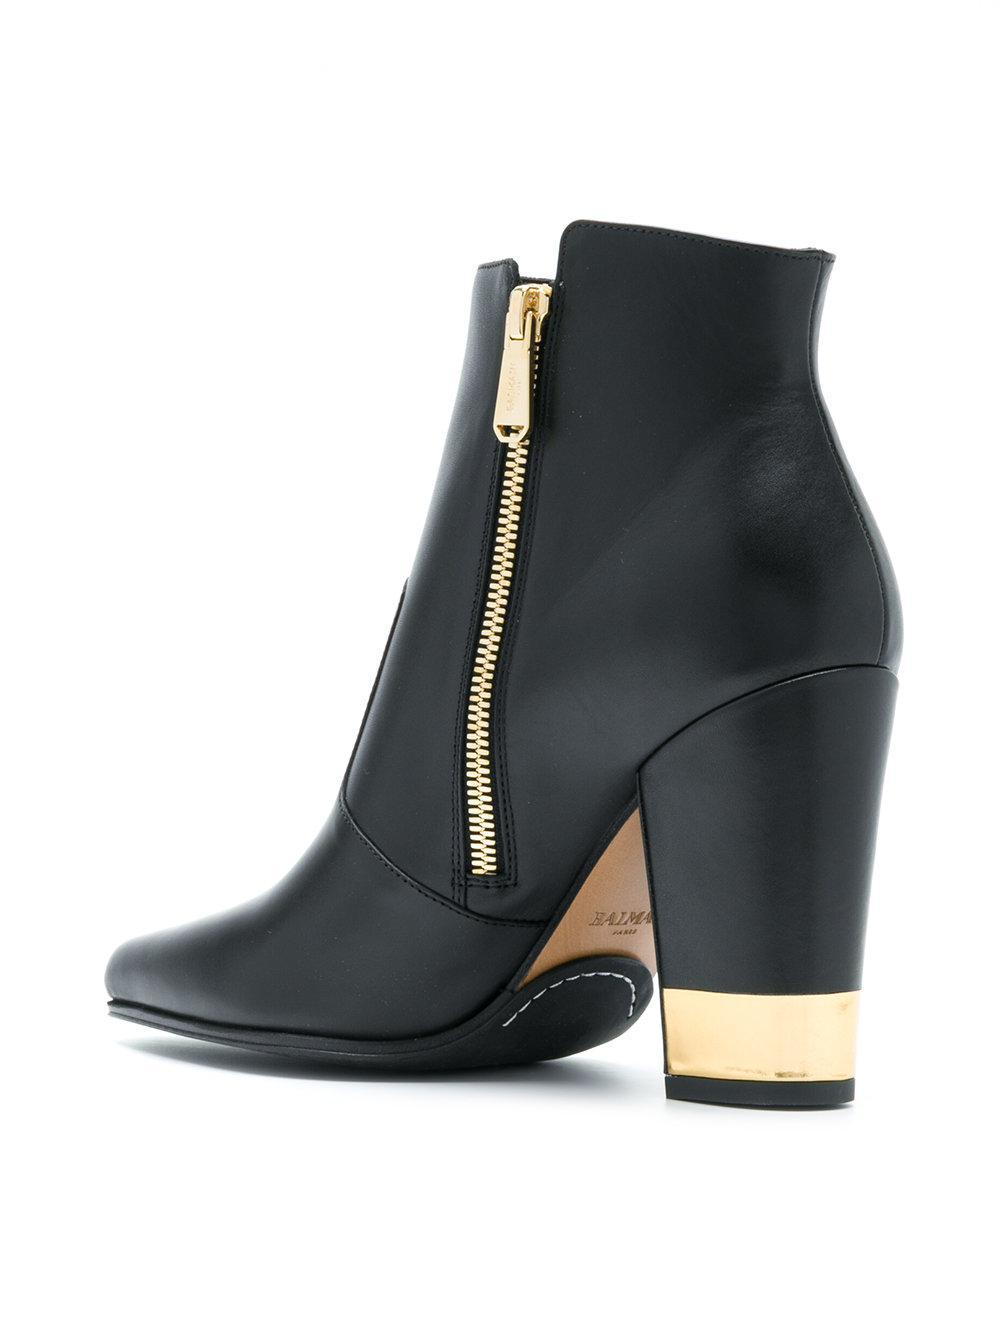 metallic heel boots - Black Balmain J0zlzSv